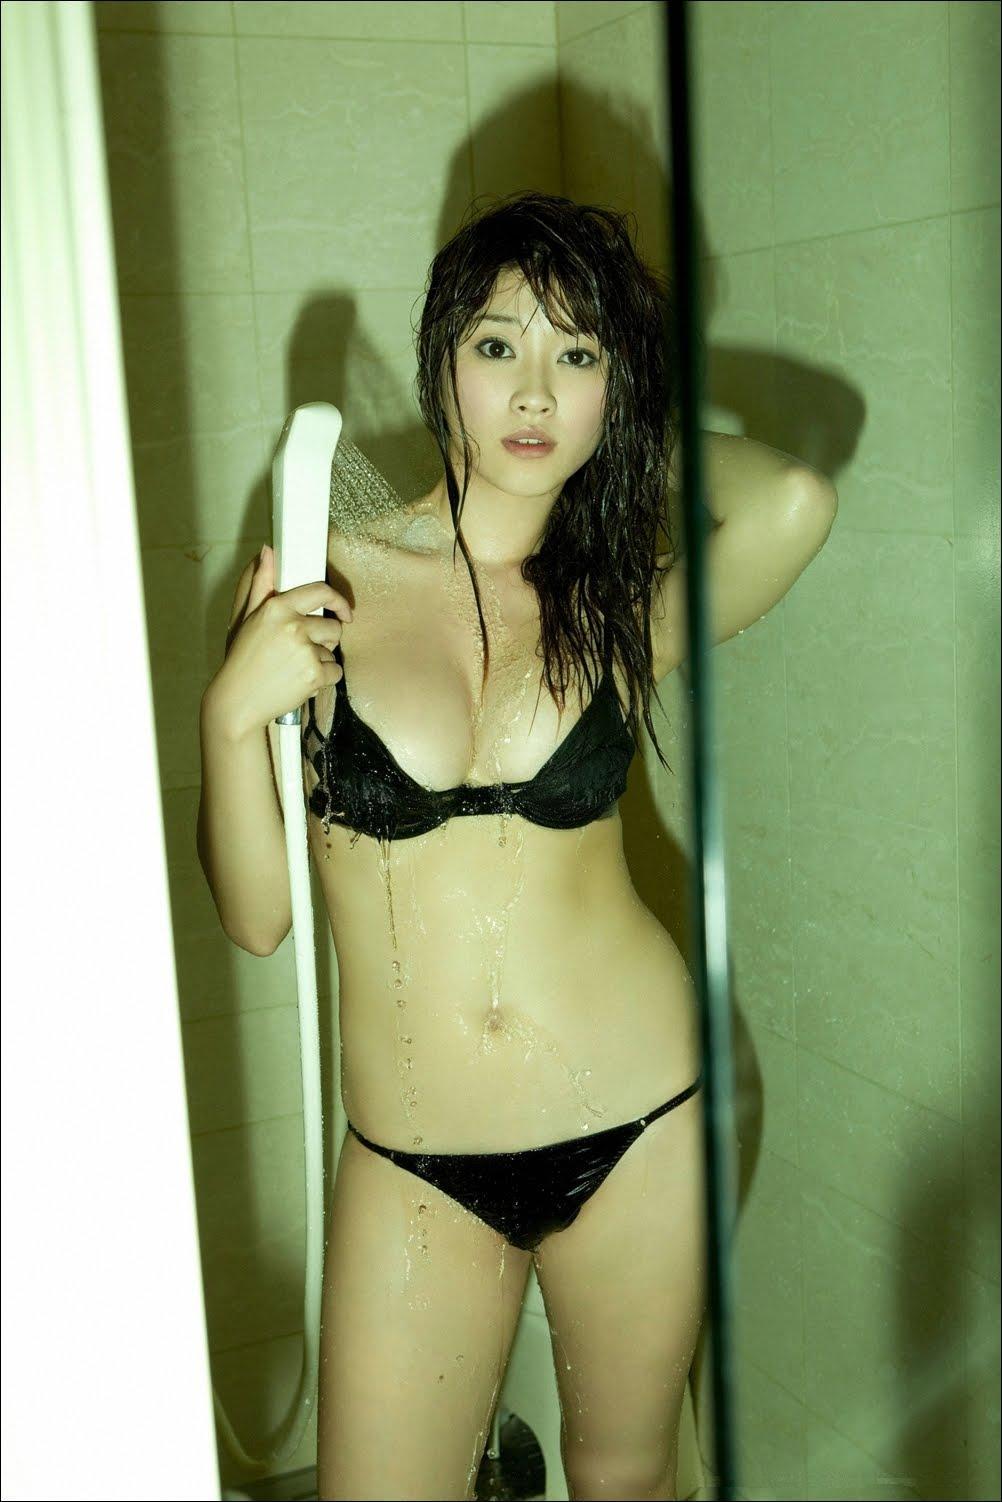 http://1.bp.blogspot.com/-LmnCwkgsYJg/Ths6-fqWACI/AAAAAAAAAgI/S_l0fb91sfU/s1600/ShowerPan3.jpg